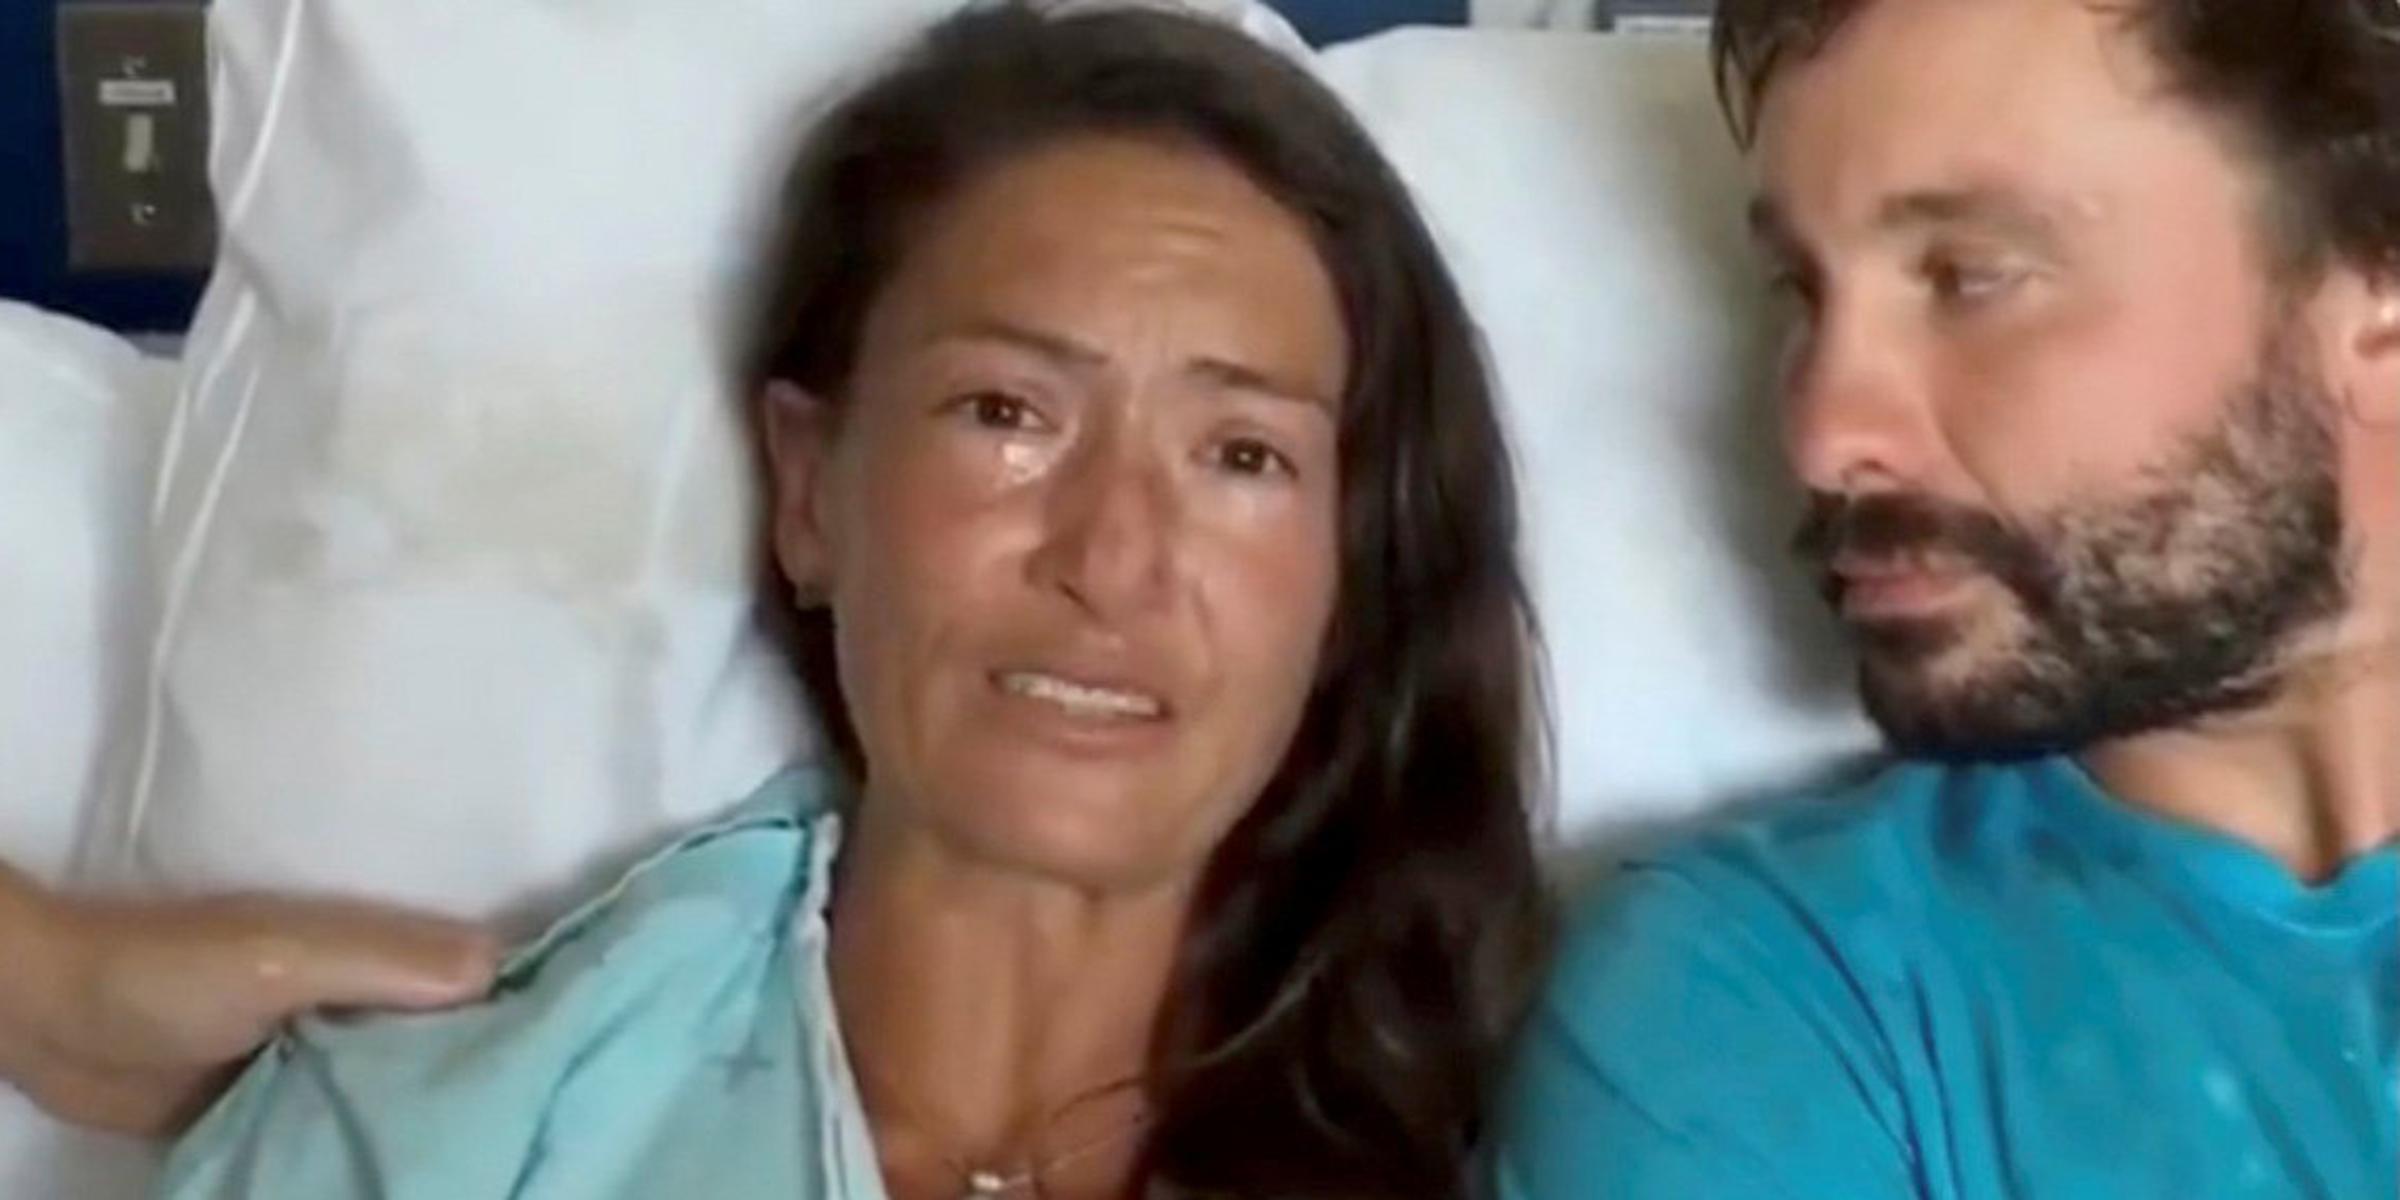 Rescued hiker Amanda Eller speaks out after missing in Hawaii forest for 17 days